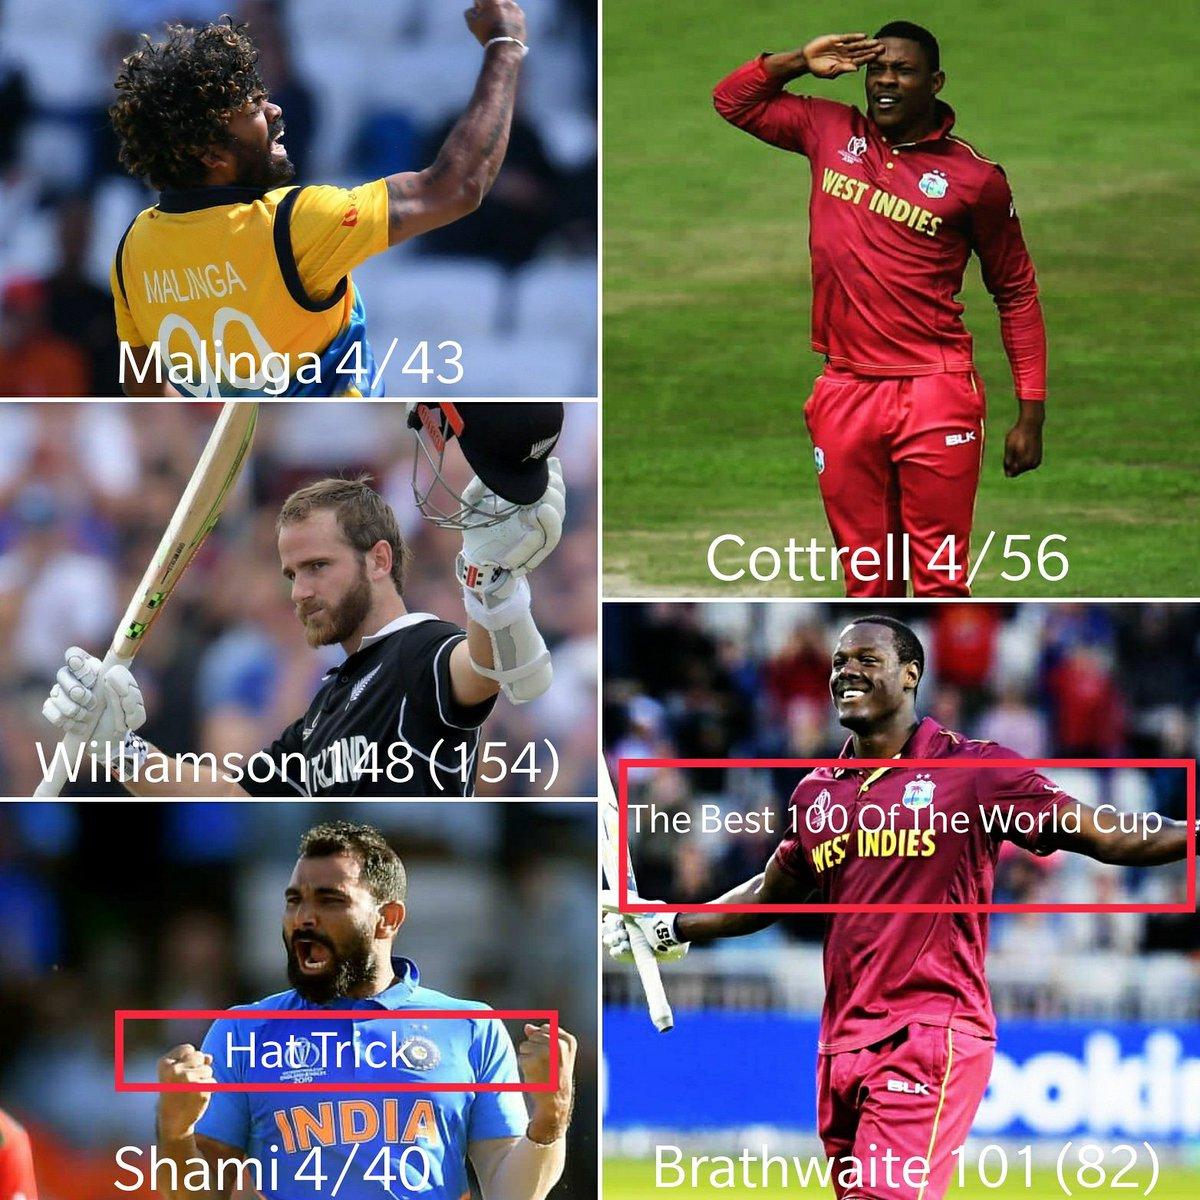 The best 2 days of cricket at the World Cup thus far. Thanks to these men 💯#starsportsIndia #ICCWorldCup2019 #kanewilliamson #CarlosBrathwaite #Shami #Malinga #SheldonCottrell #cricket